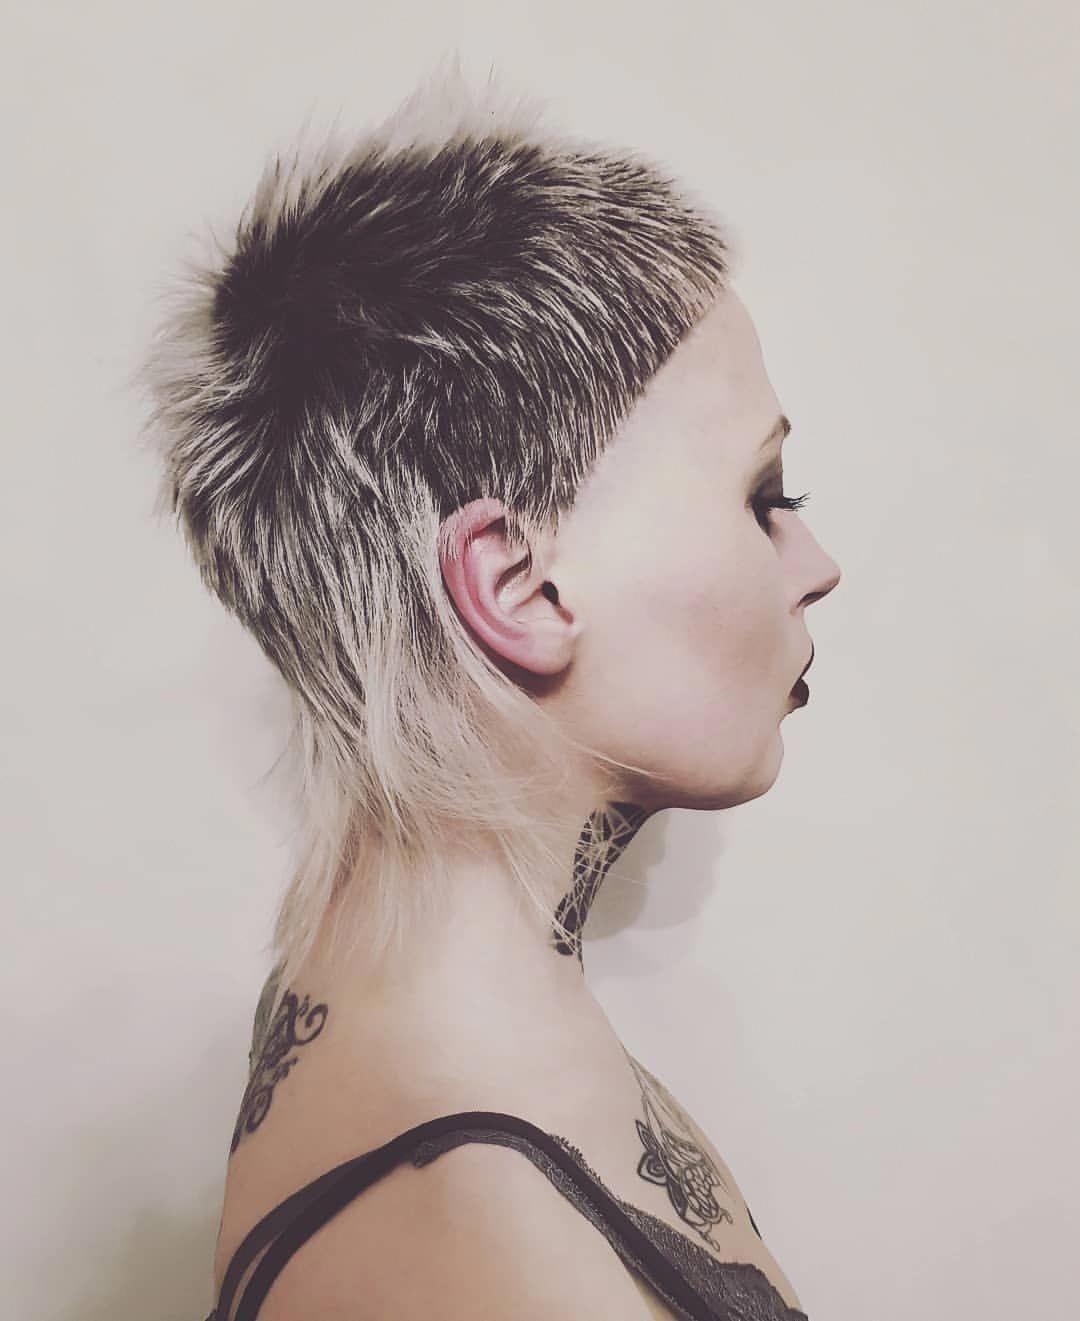 Pixiemullet Frisuren Kurzhaarfrisuren Und Rock Frisuren